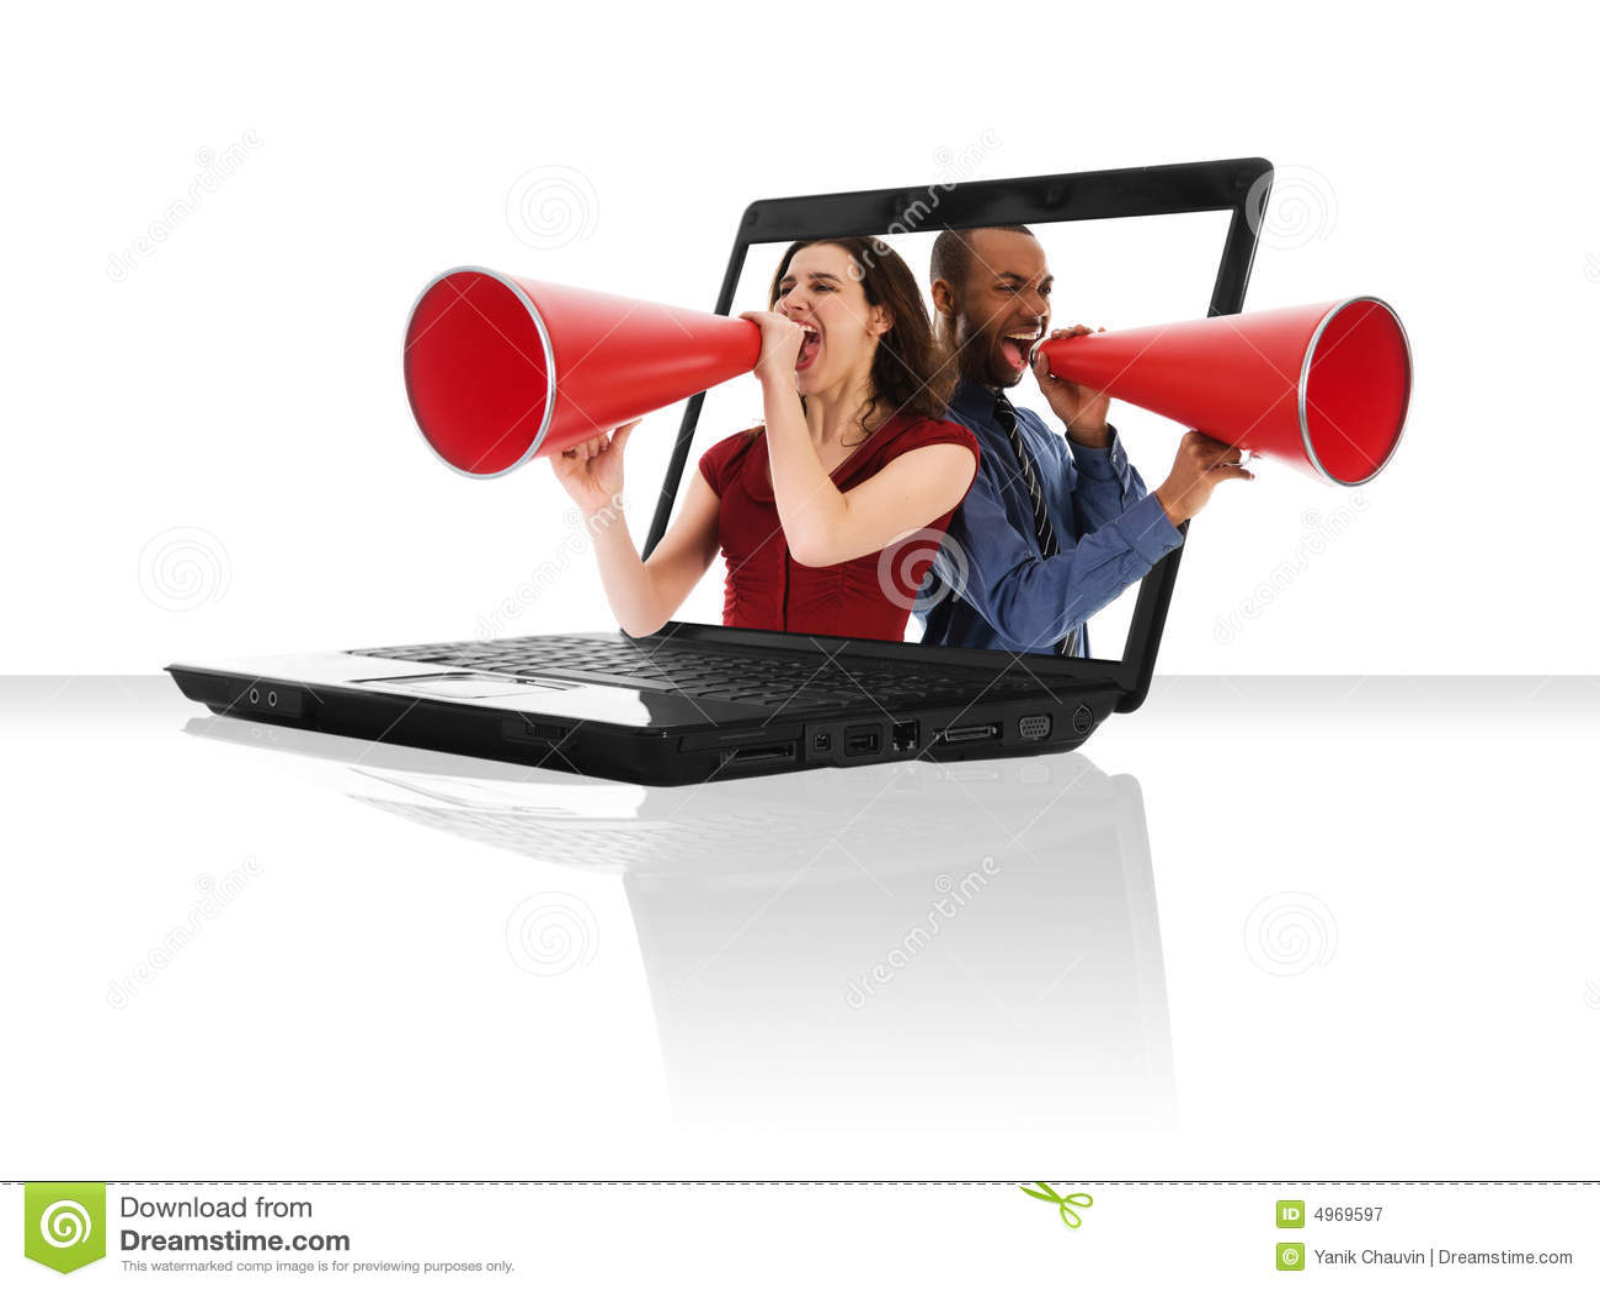 Laptop Megafoon